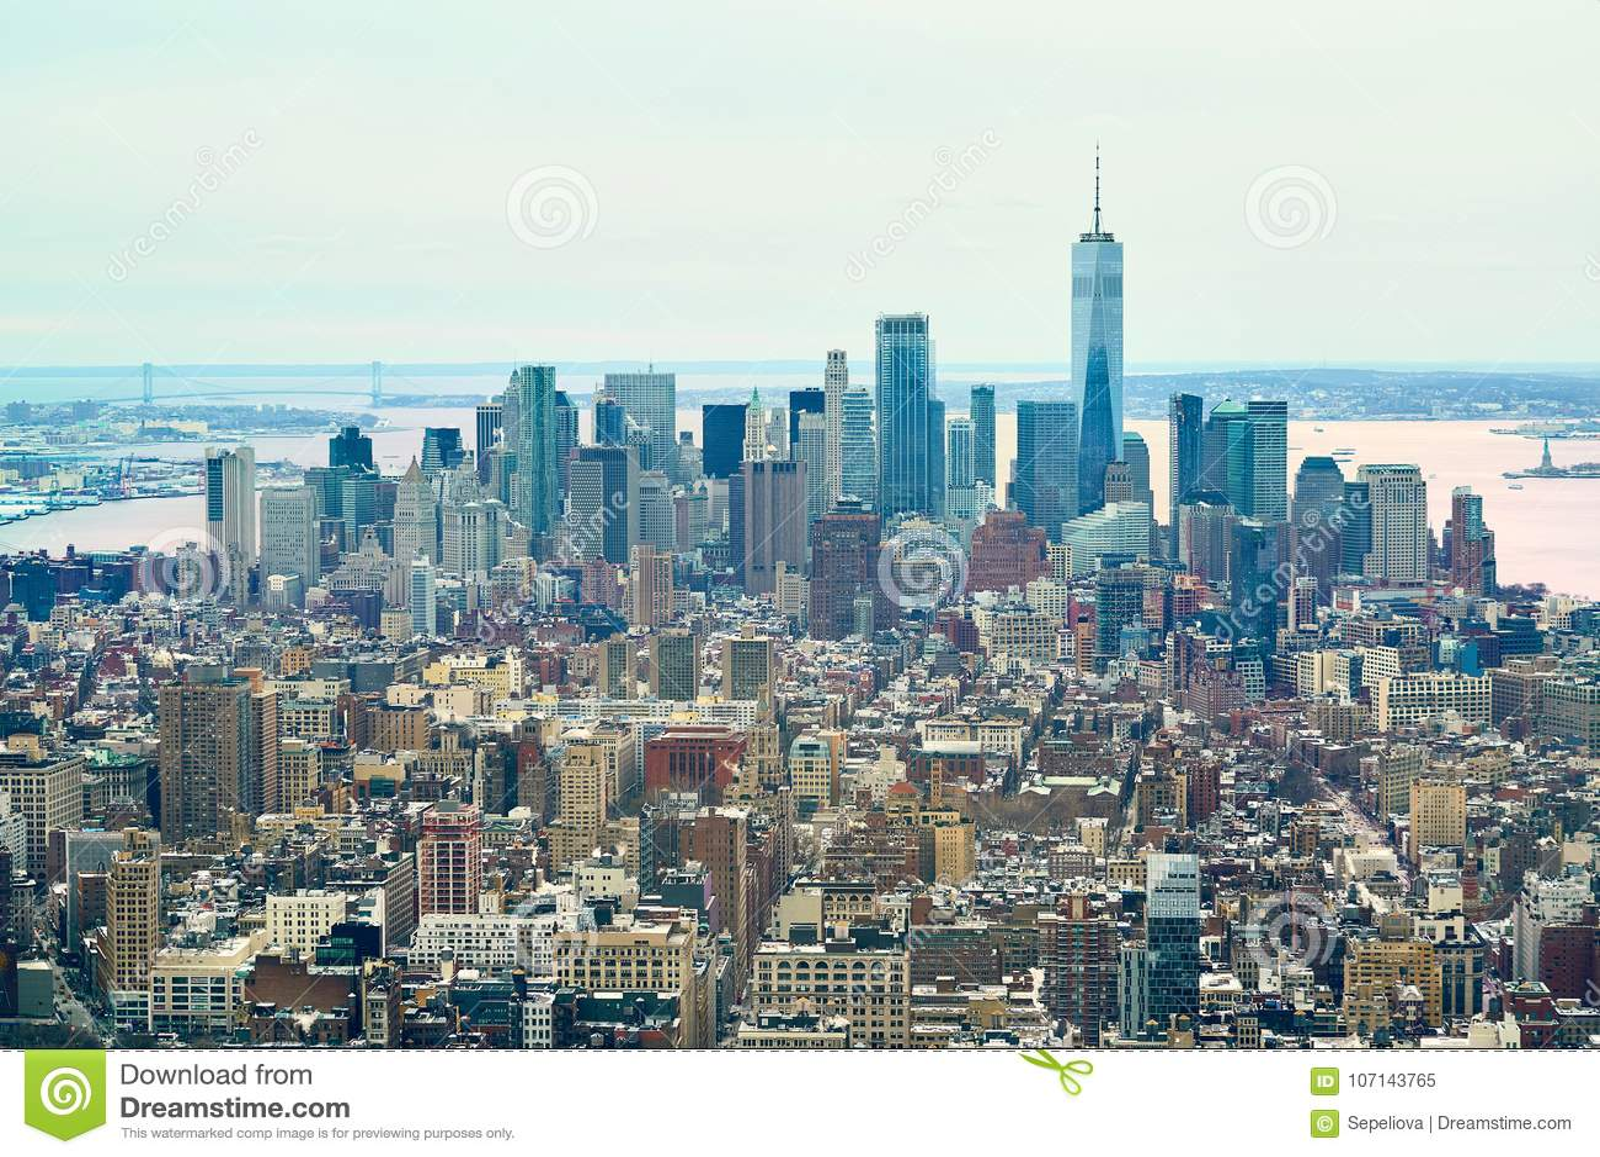 New York Skyline Panorama View From Rockefeller Center Editorial